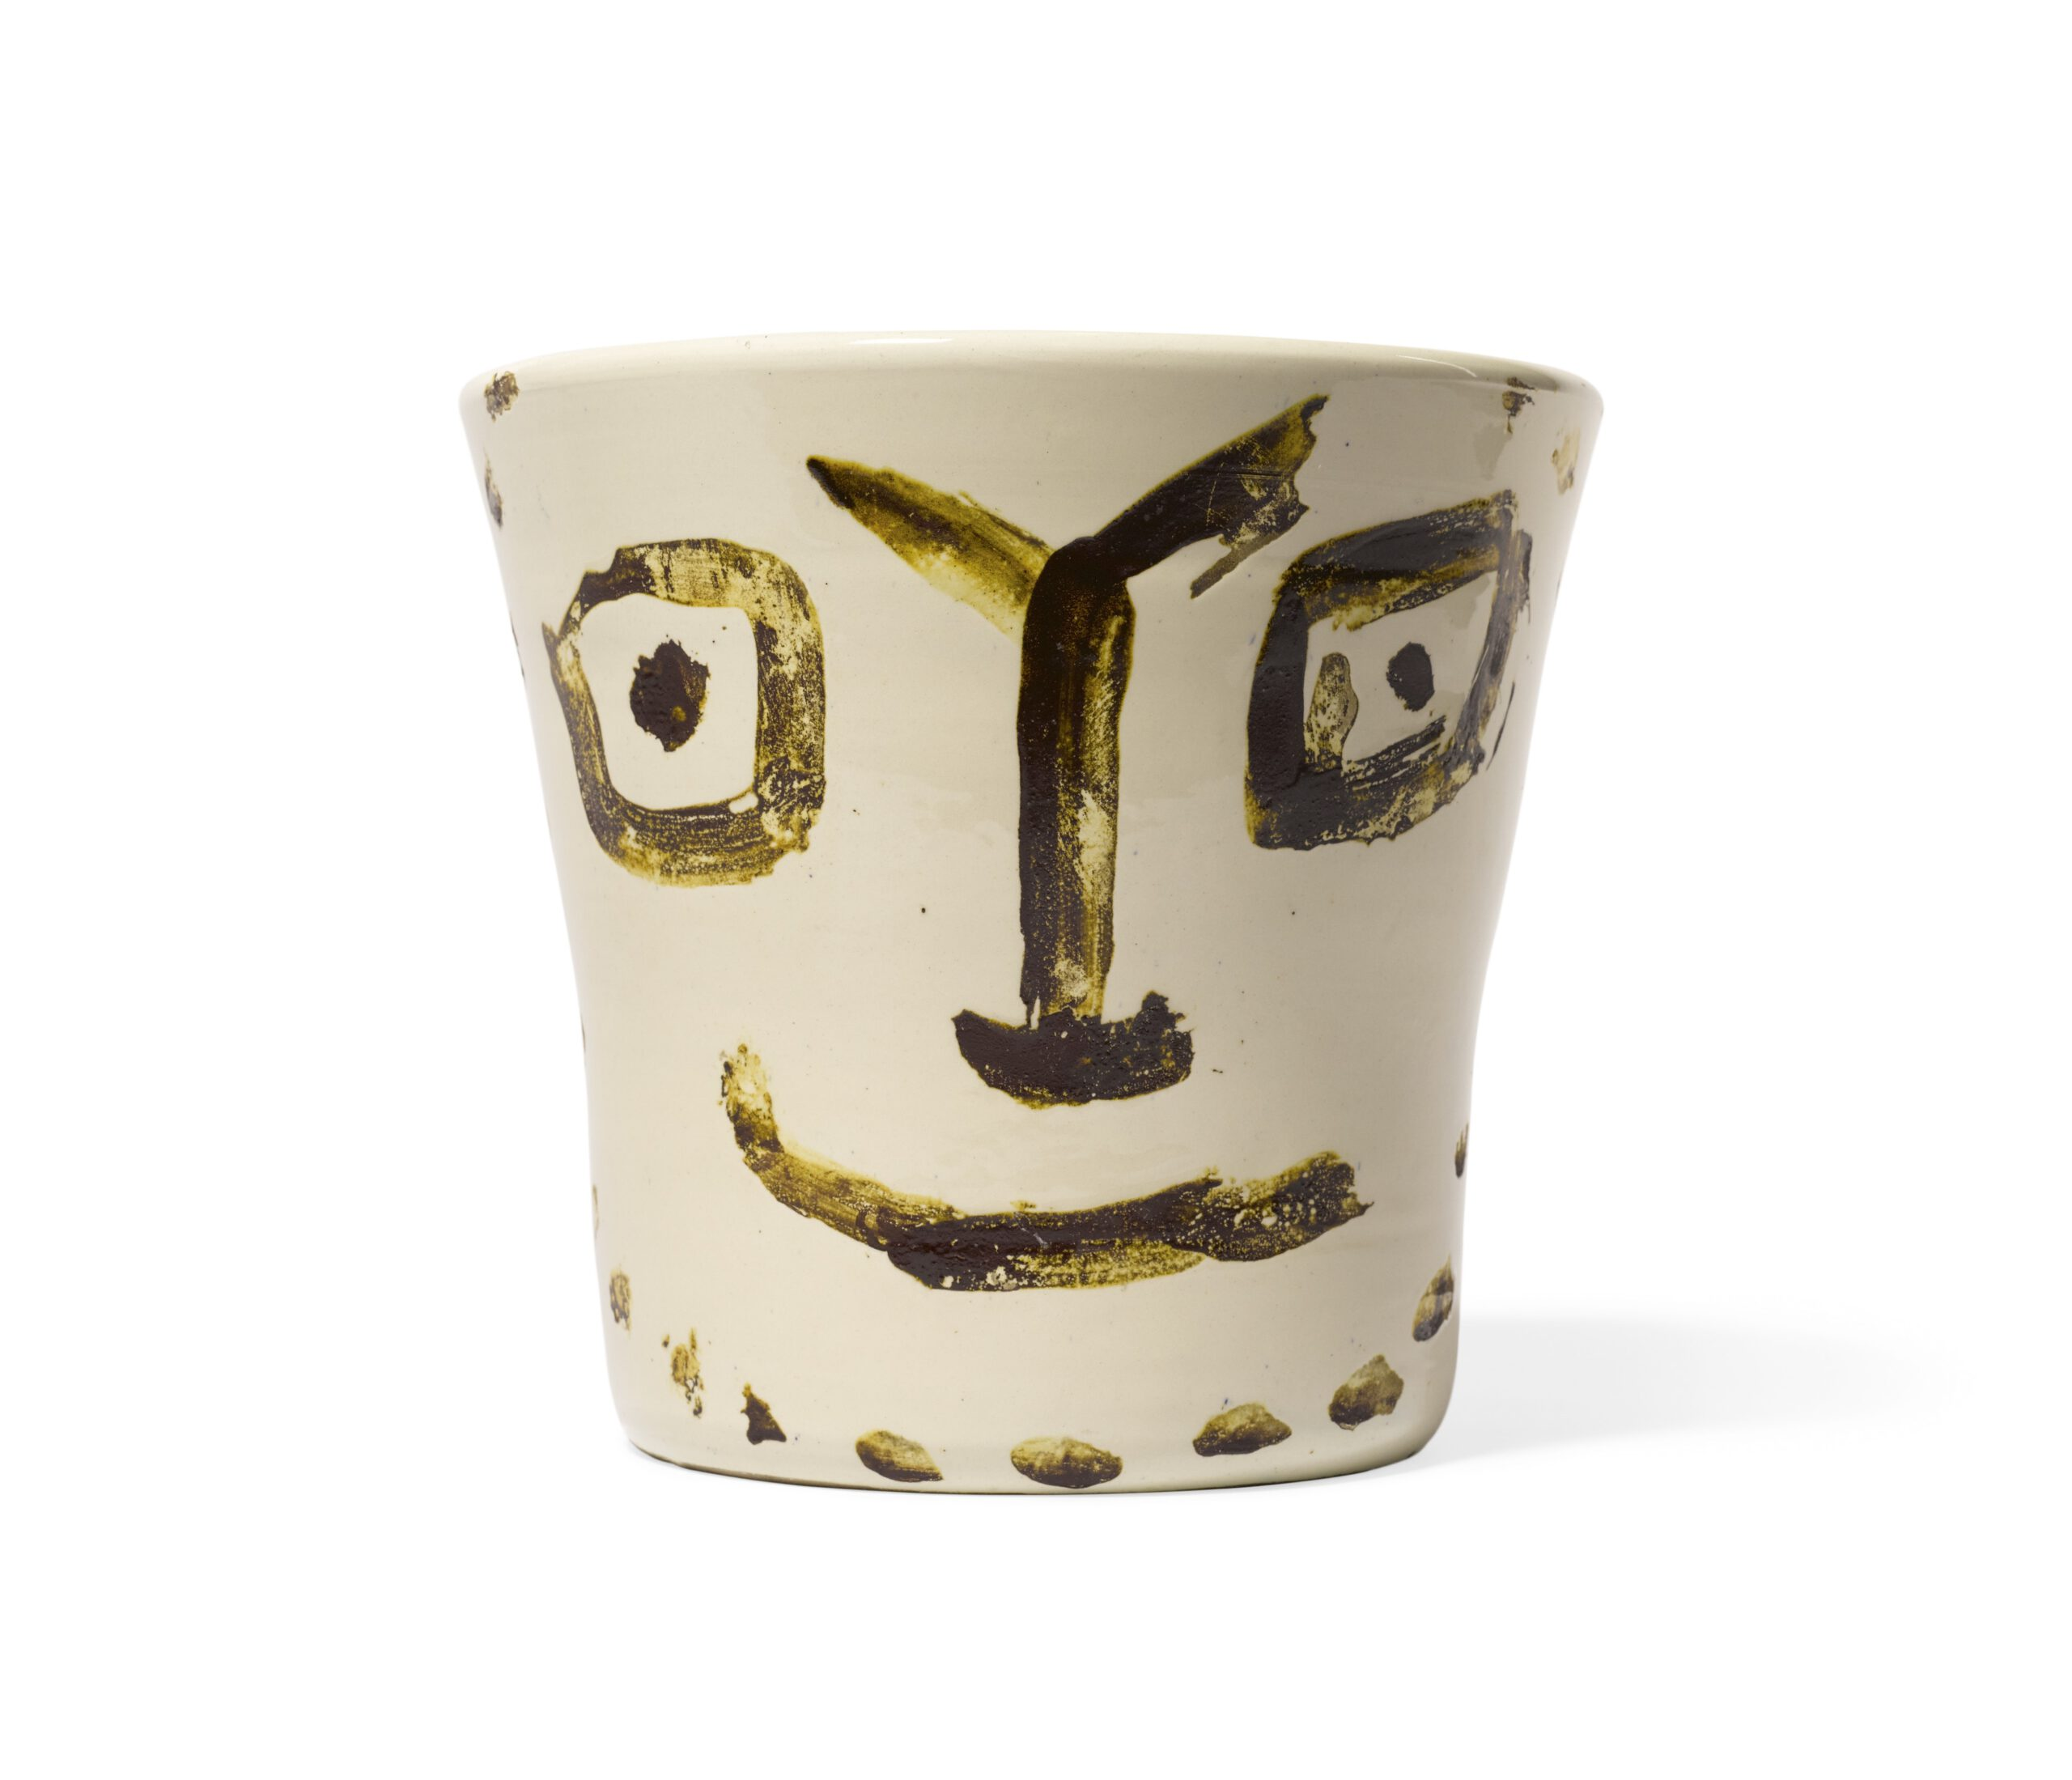 Pablo Picasso, Visage-souriant, 1956